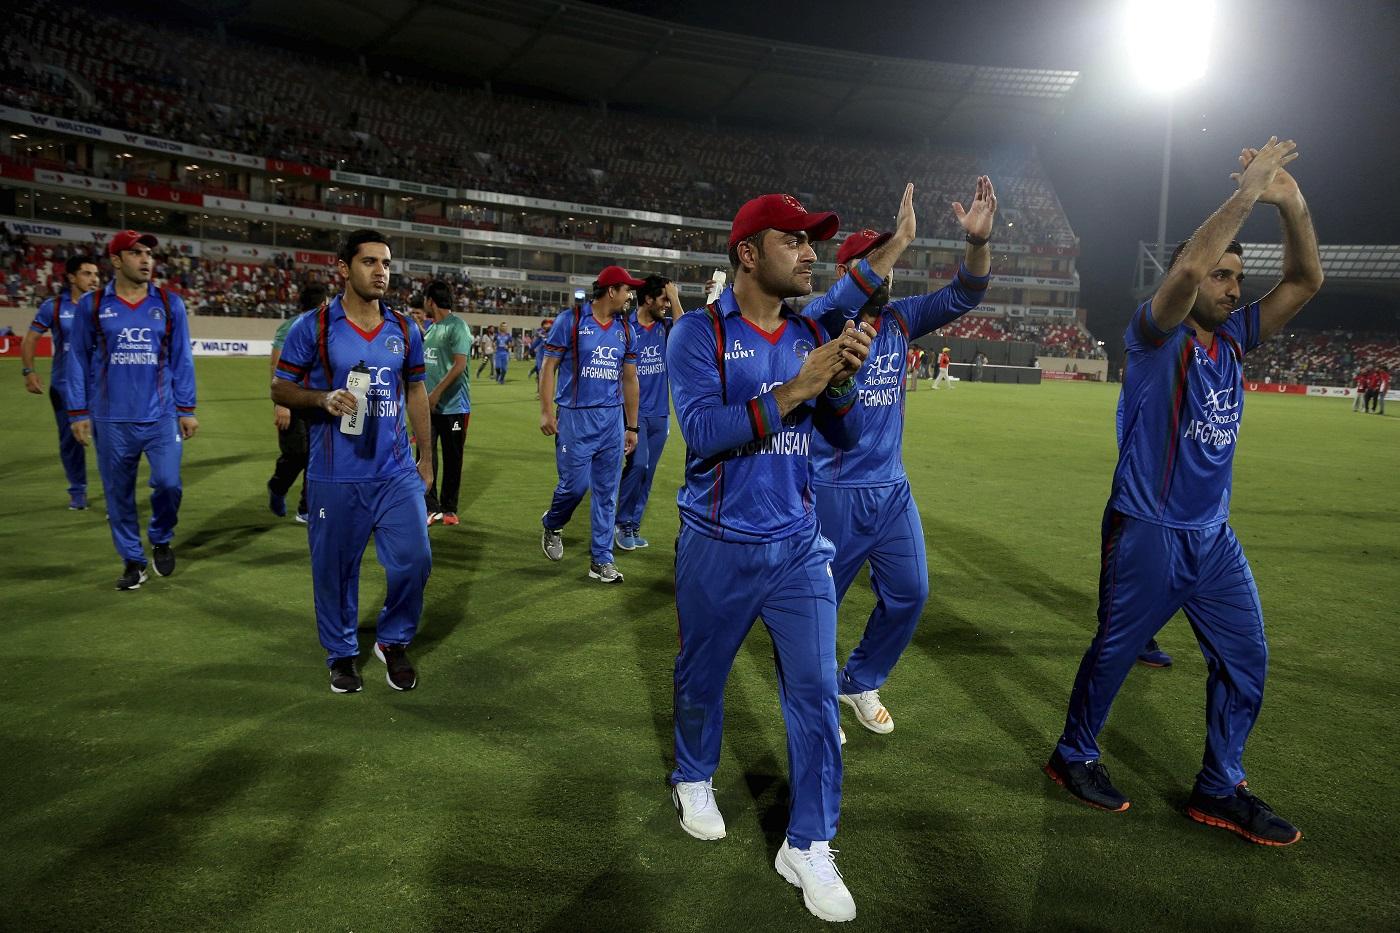 IND vs AFG 2018: We Will Not Take Afghanistan Lightly - Ajinkya Rahane 1